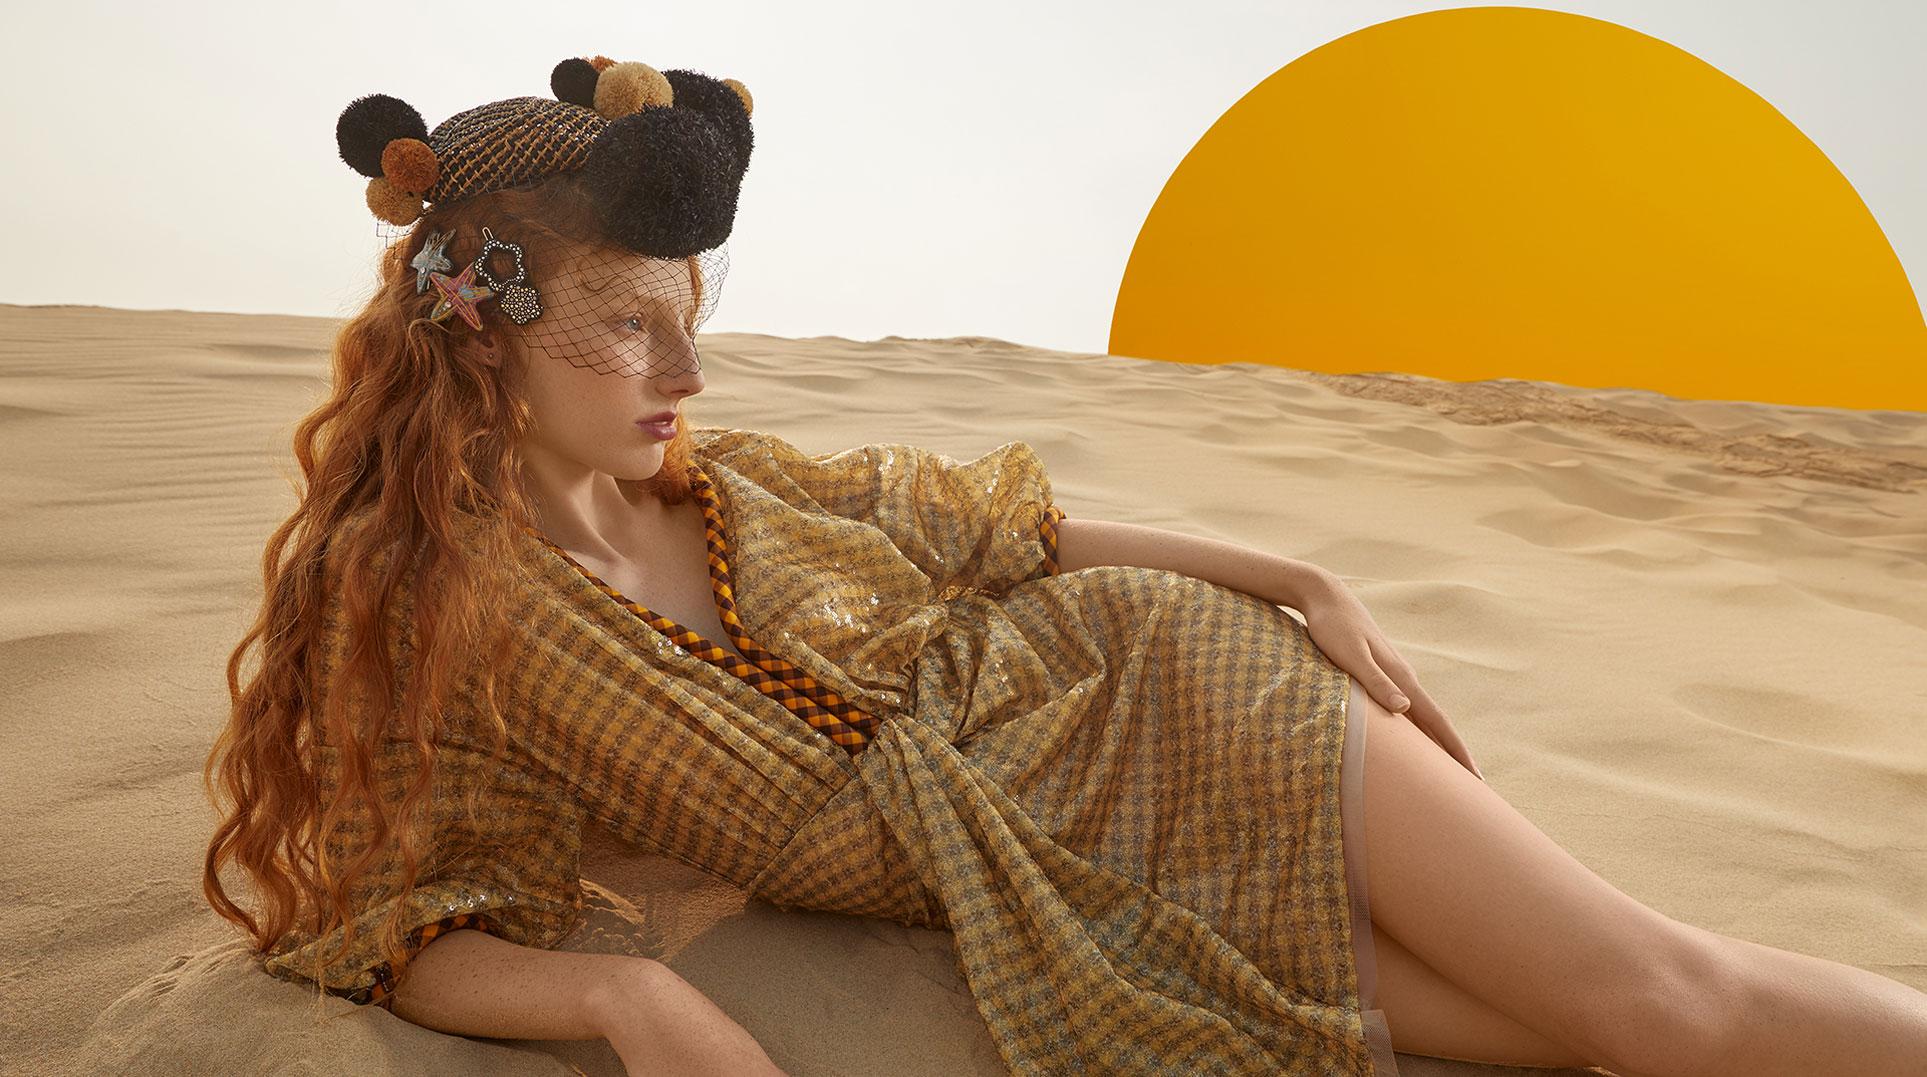 Модный маскарад в журнале Grazia / фото 01